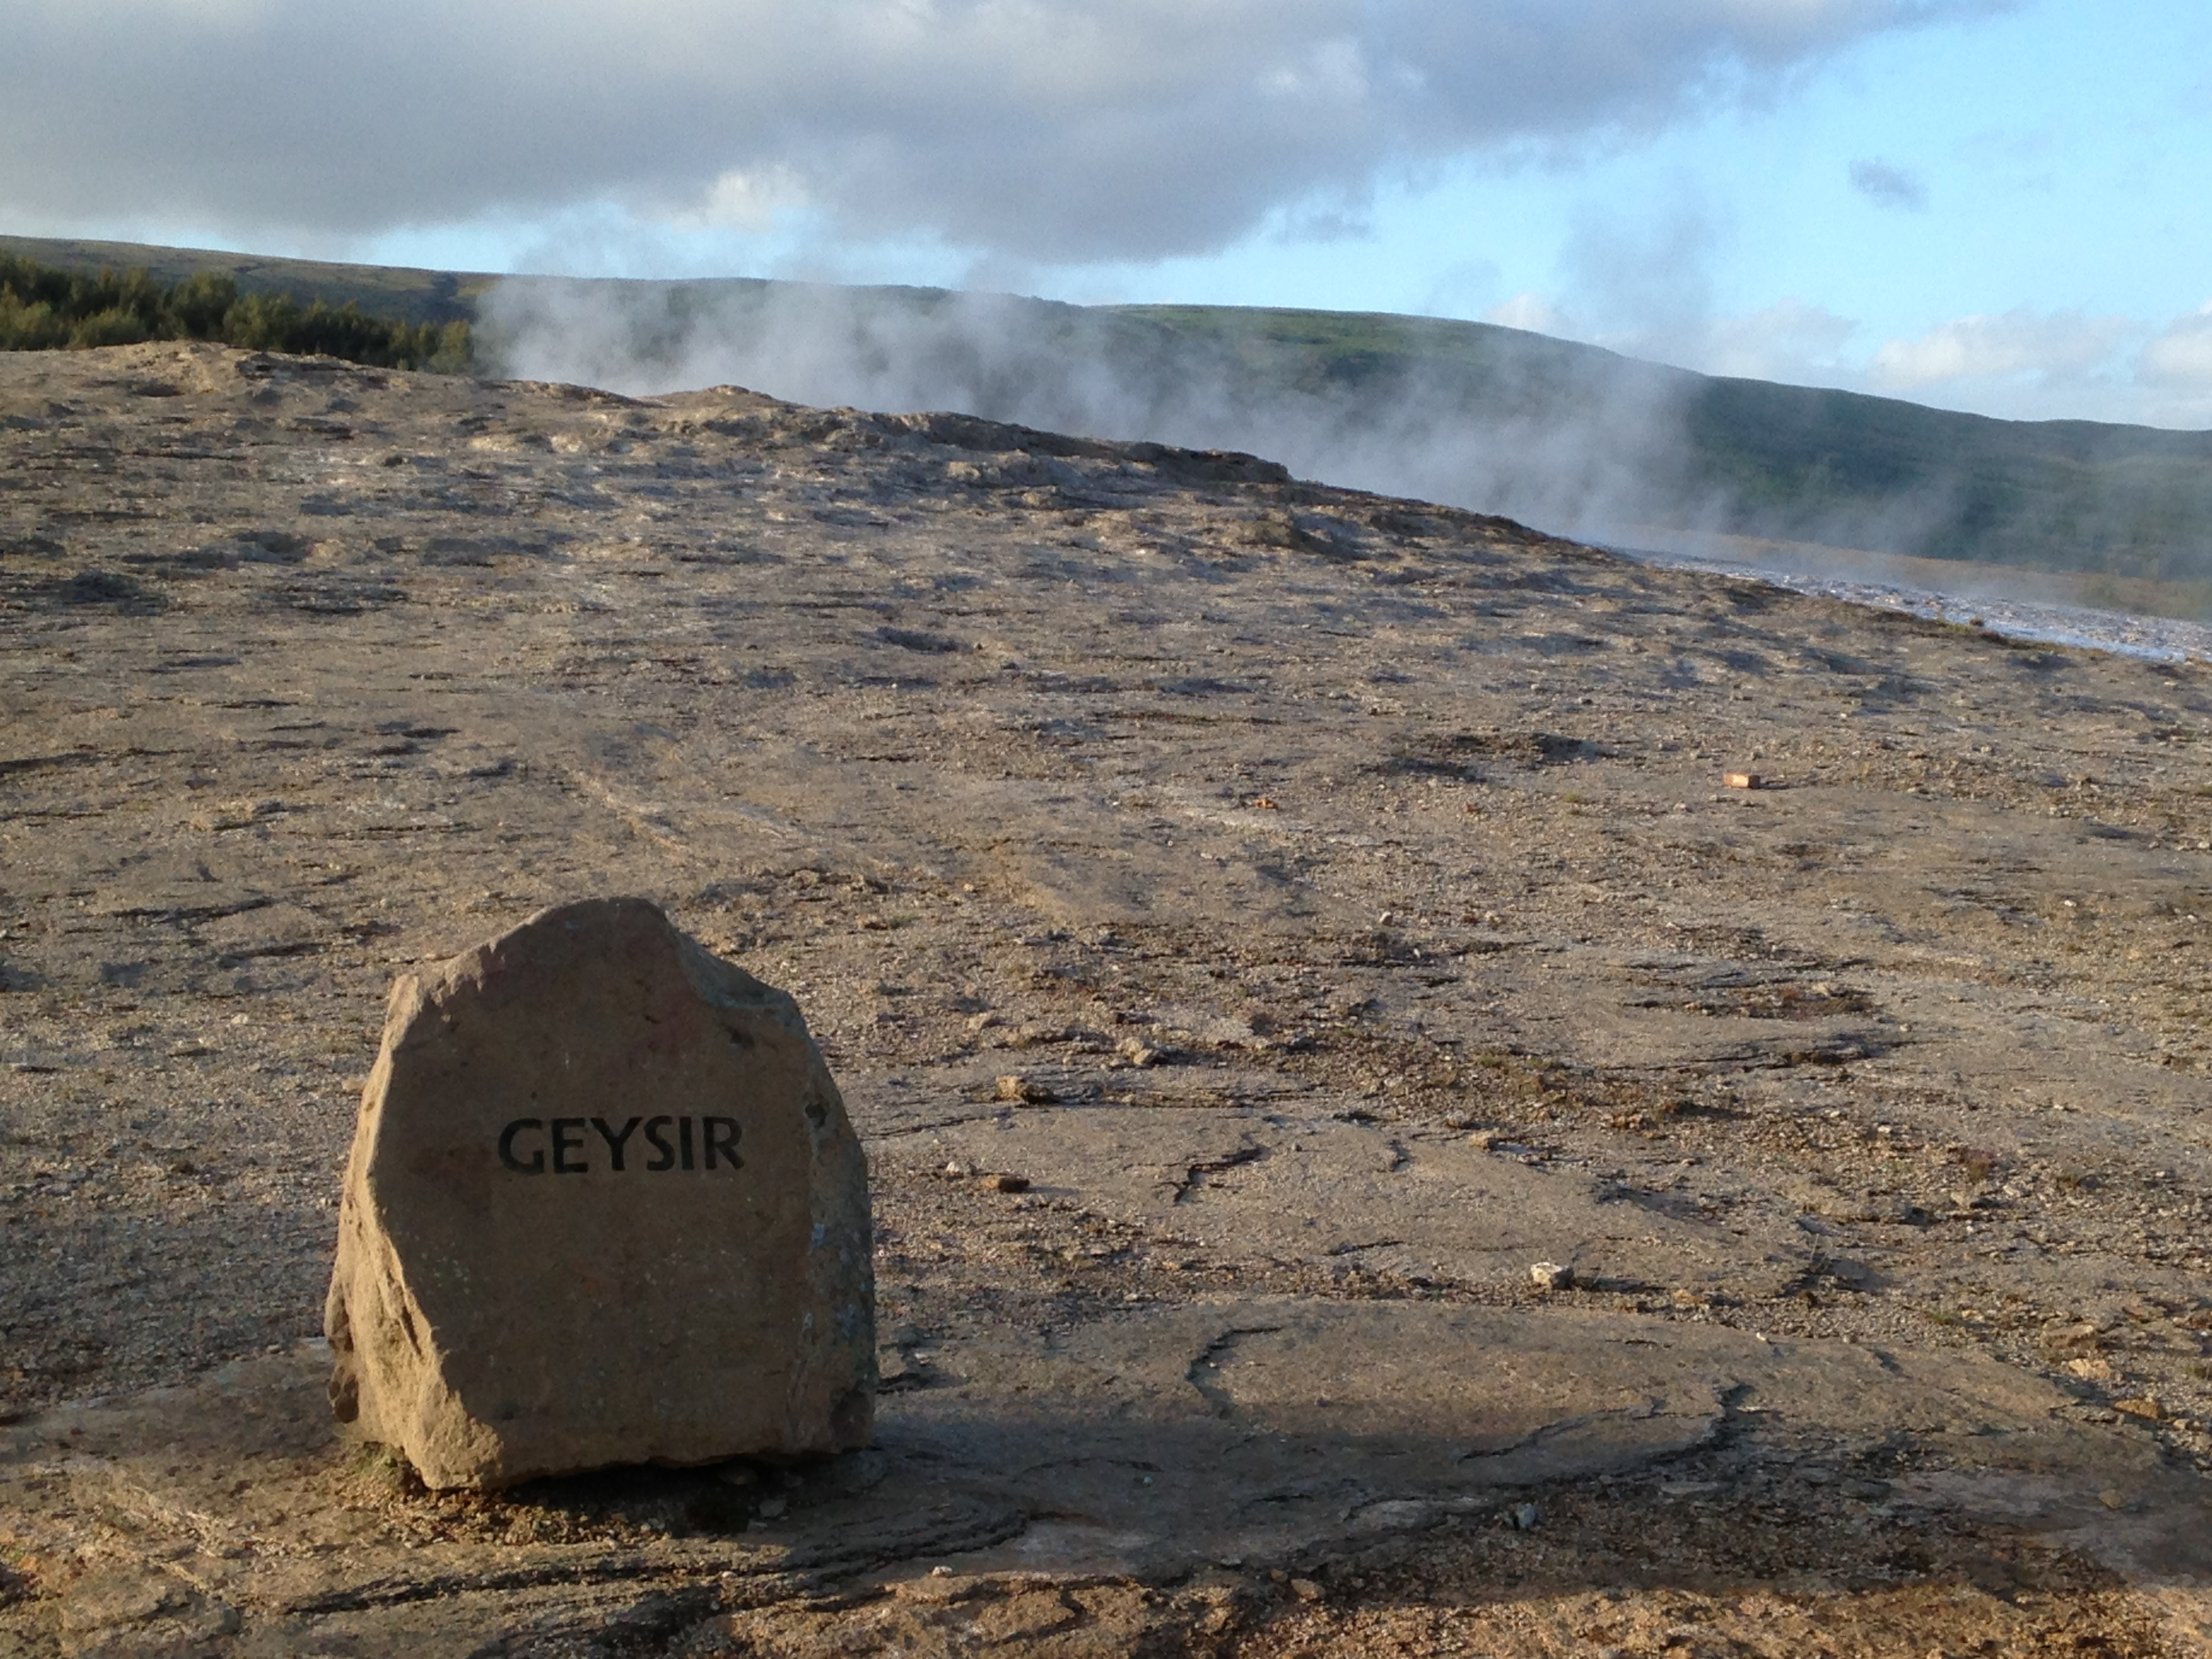 The original Geysir